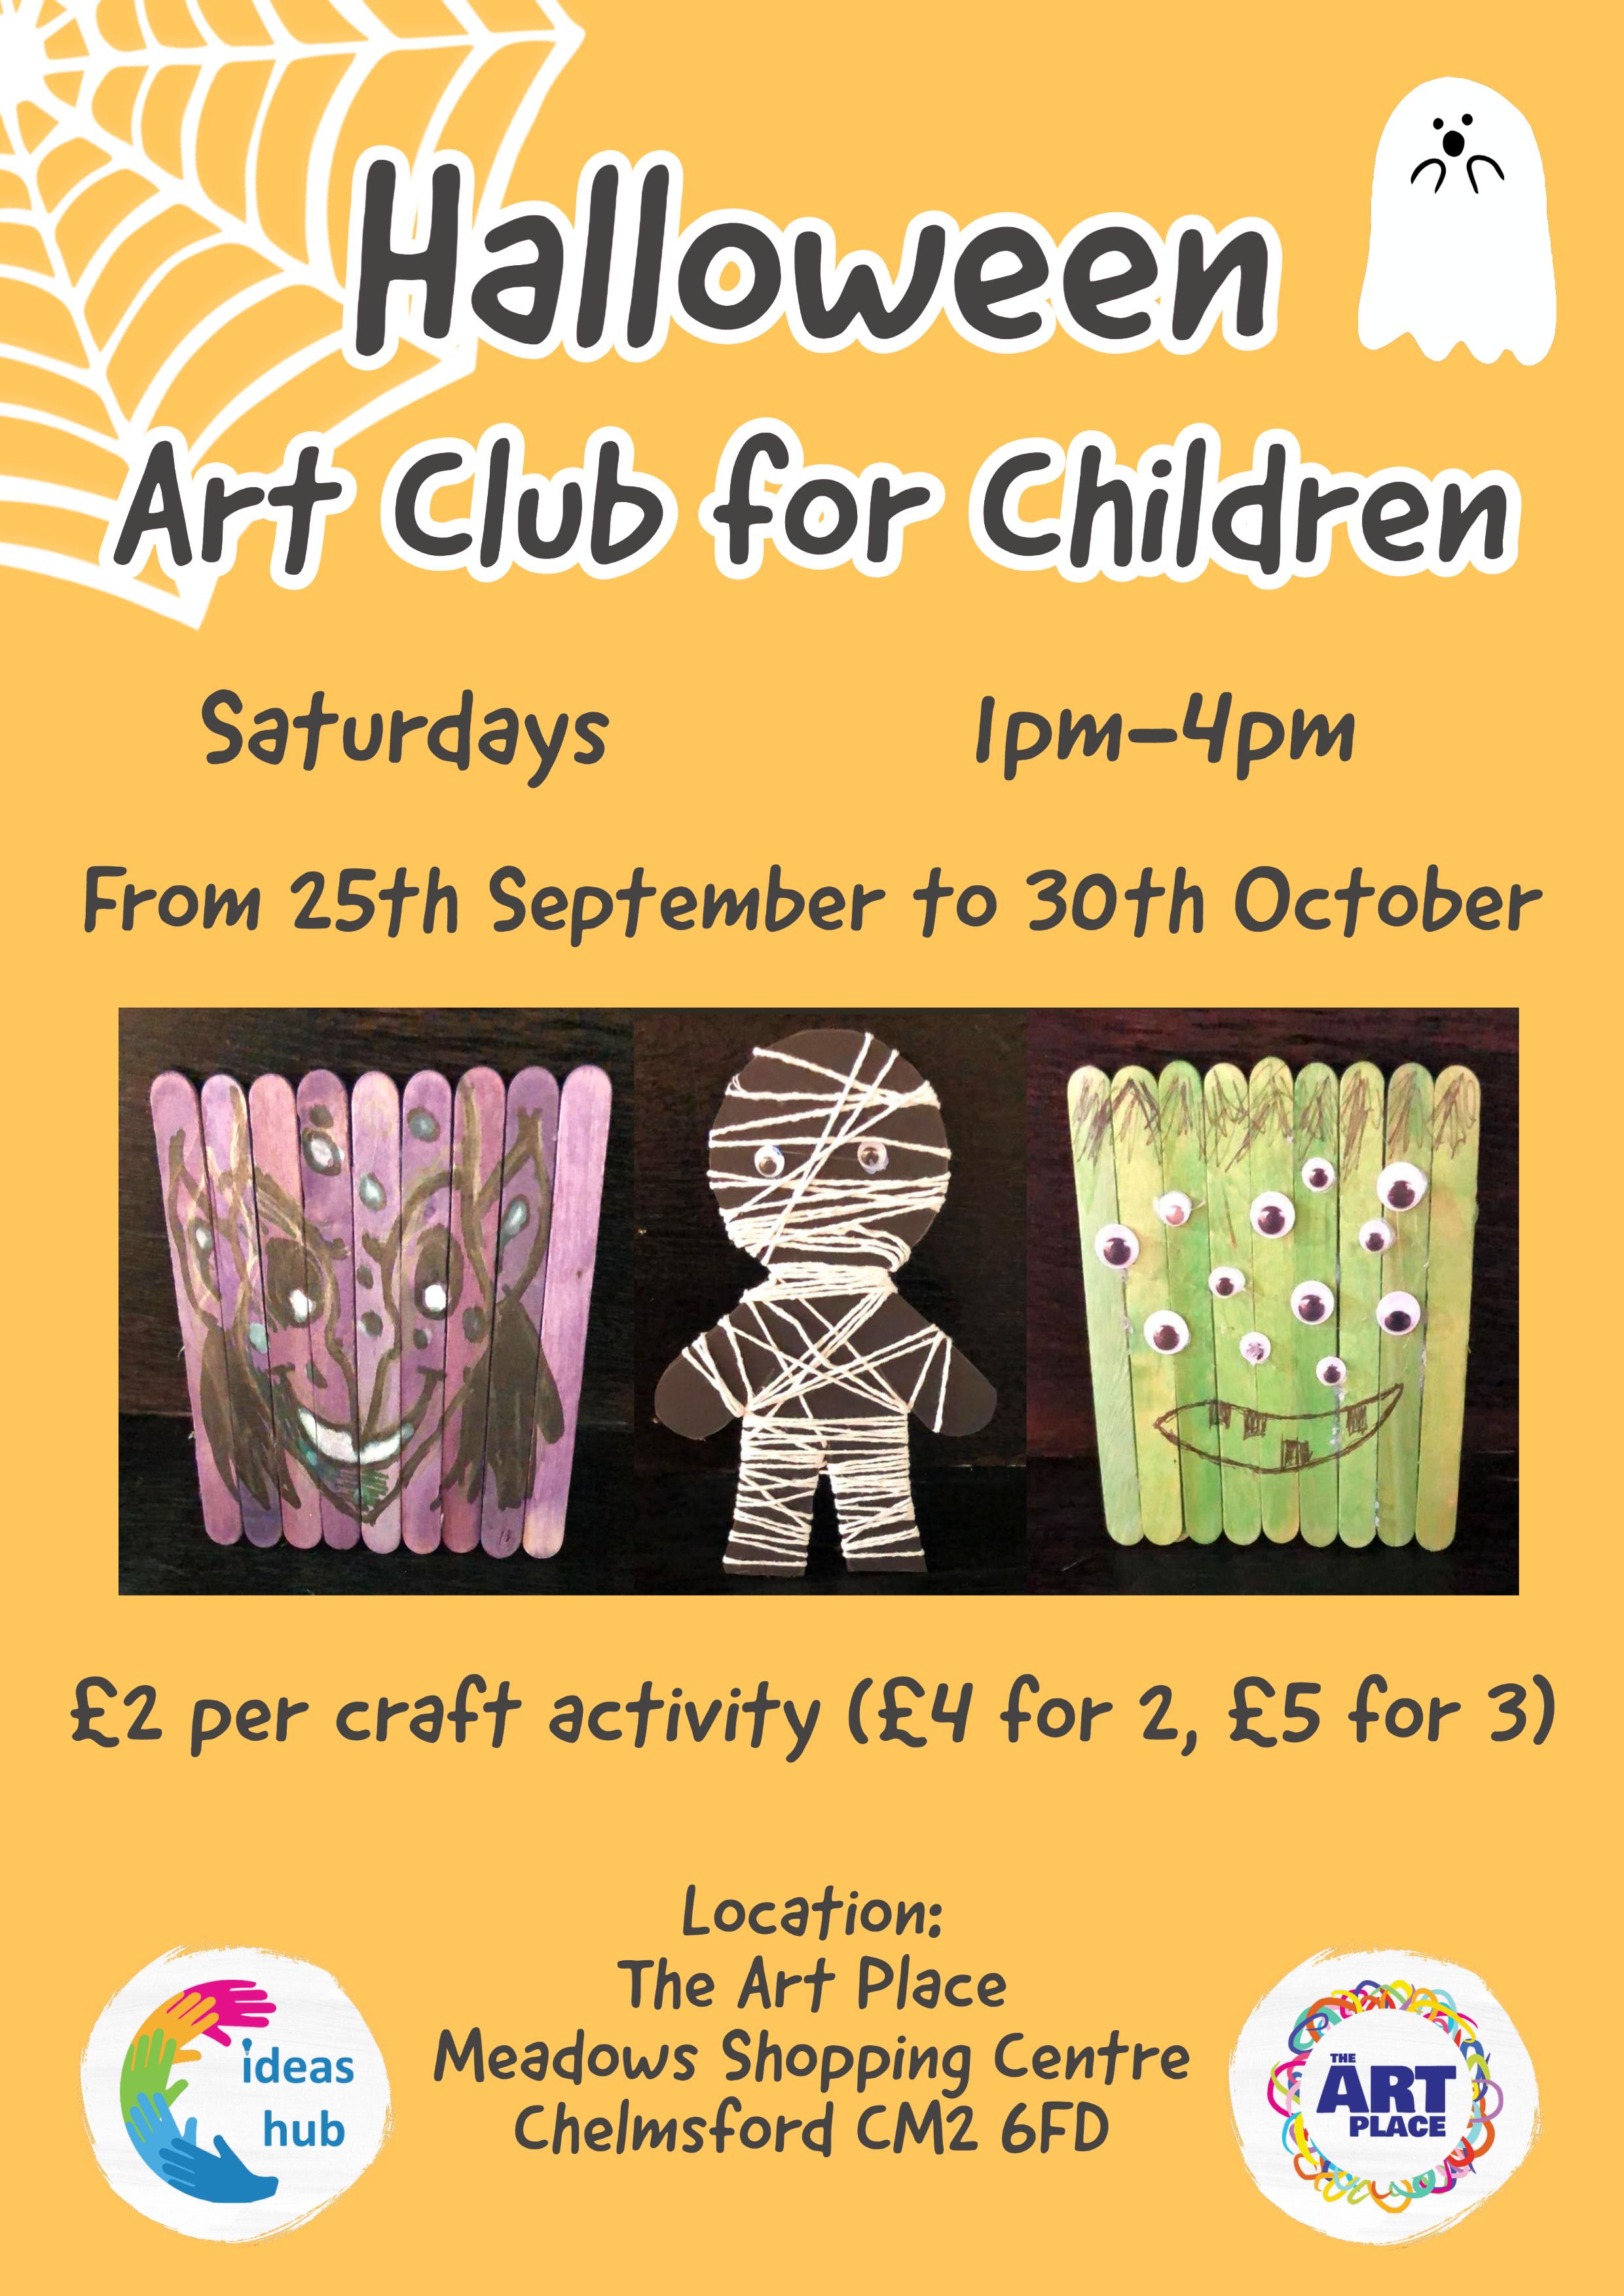 Halloween art club for children